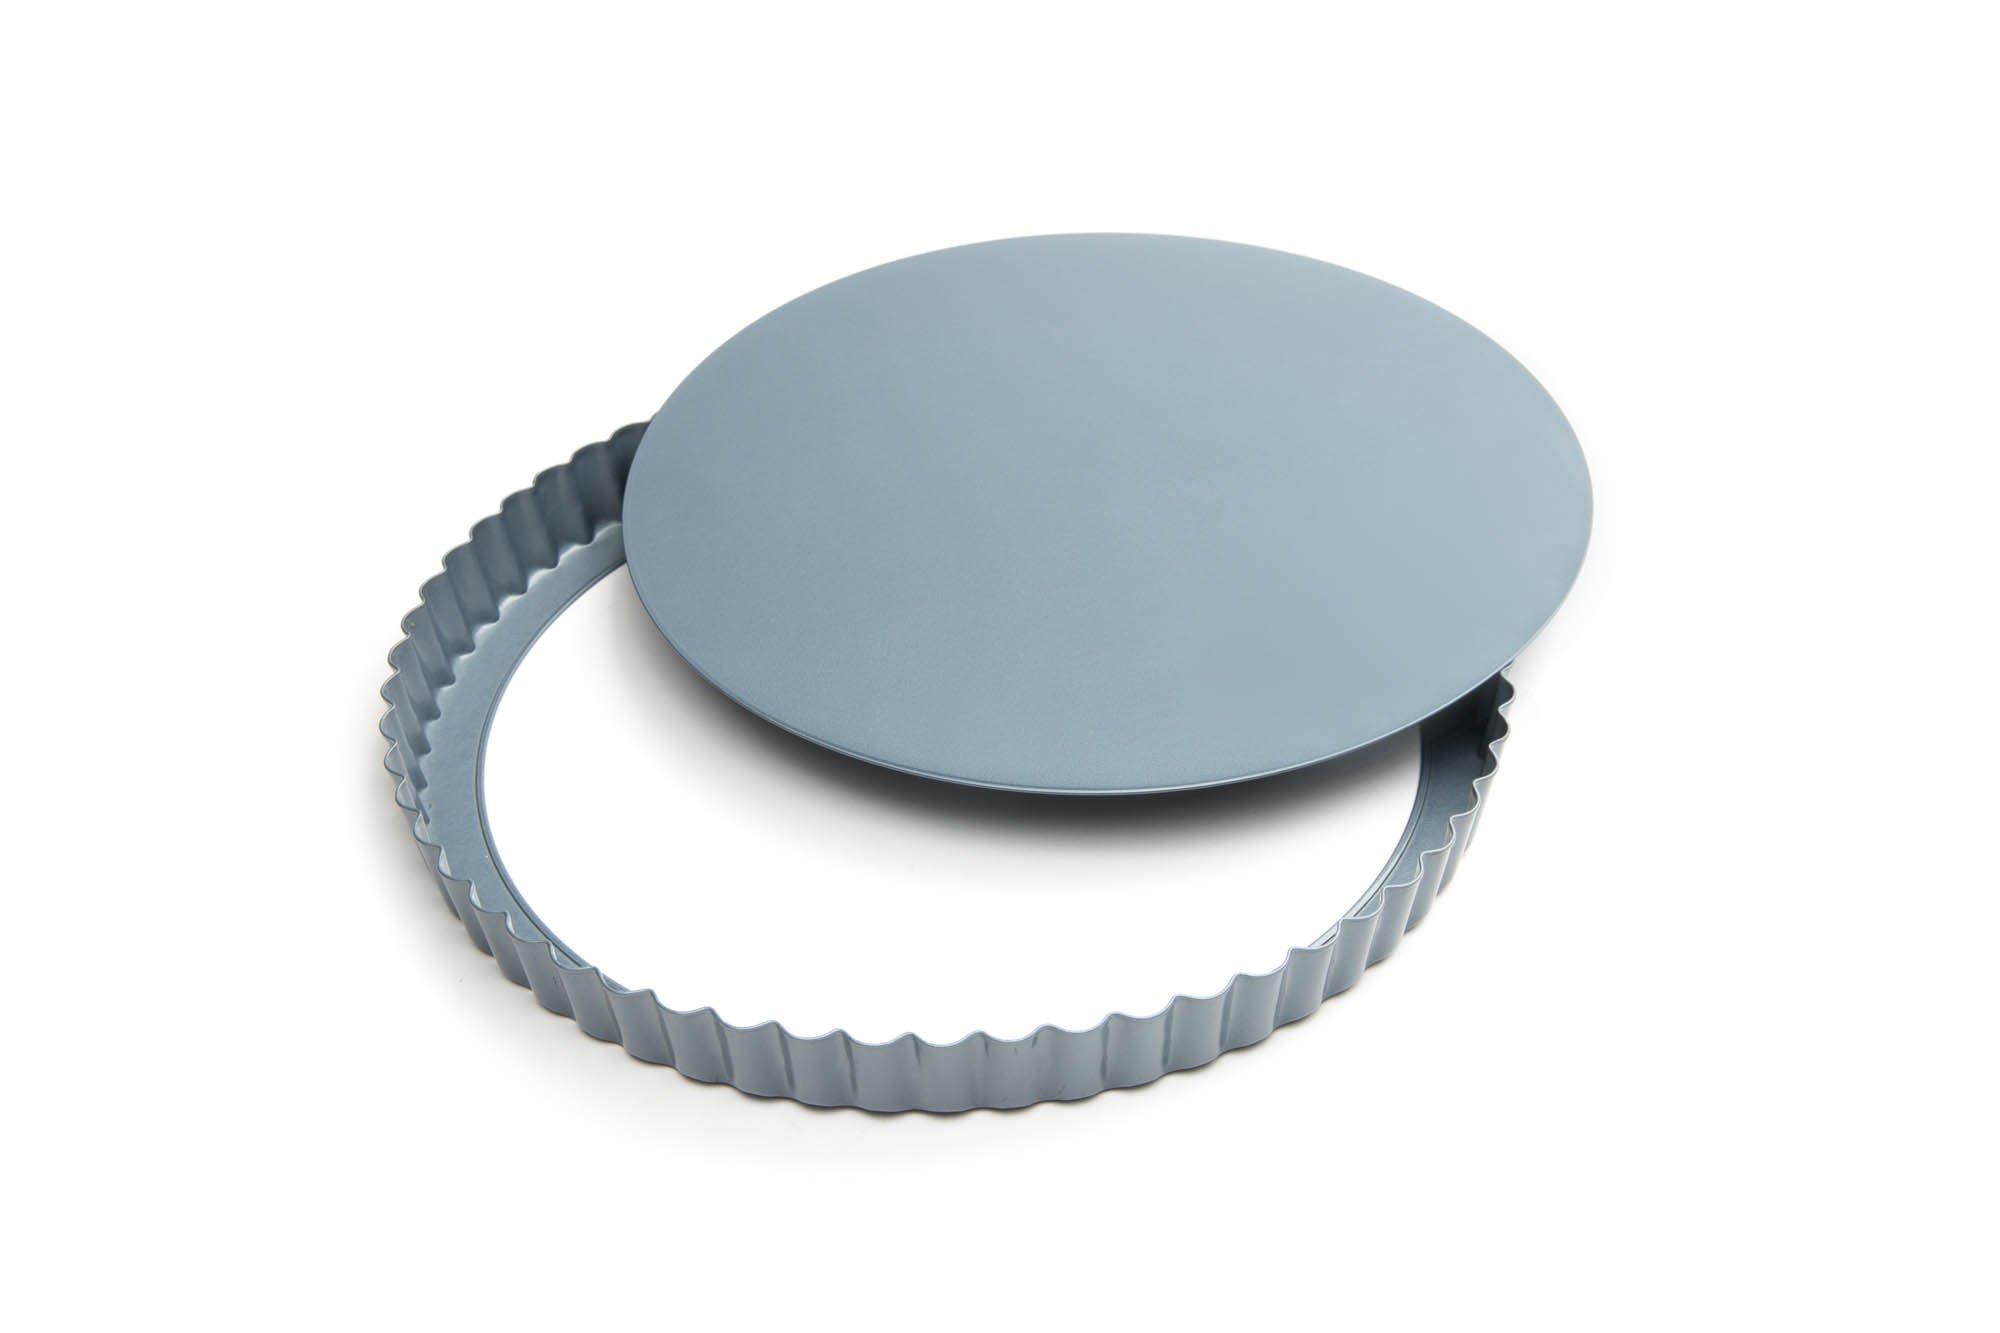 Fox Run 4435 Loose Bottom Quiche Pan, Carbon Steel, Non-Stick, 9.375-Inch